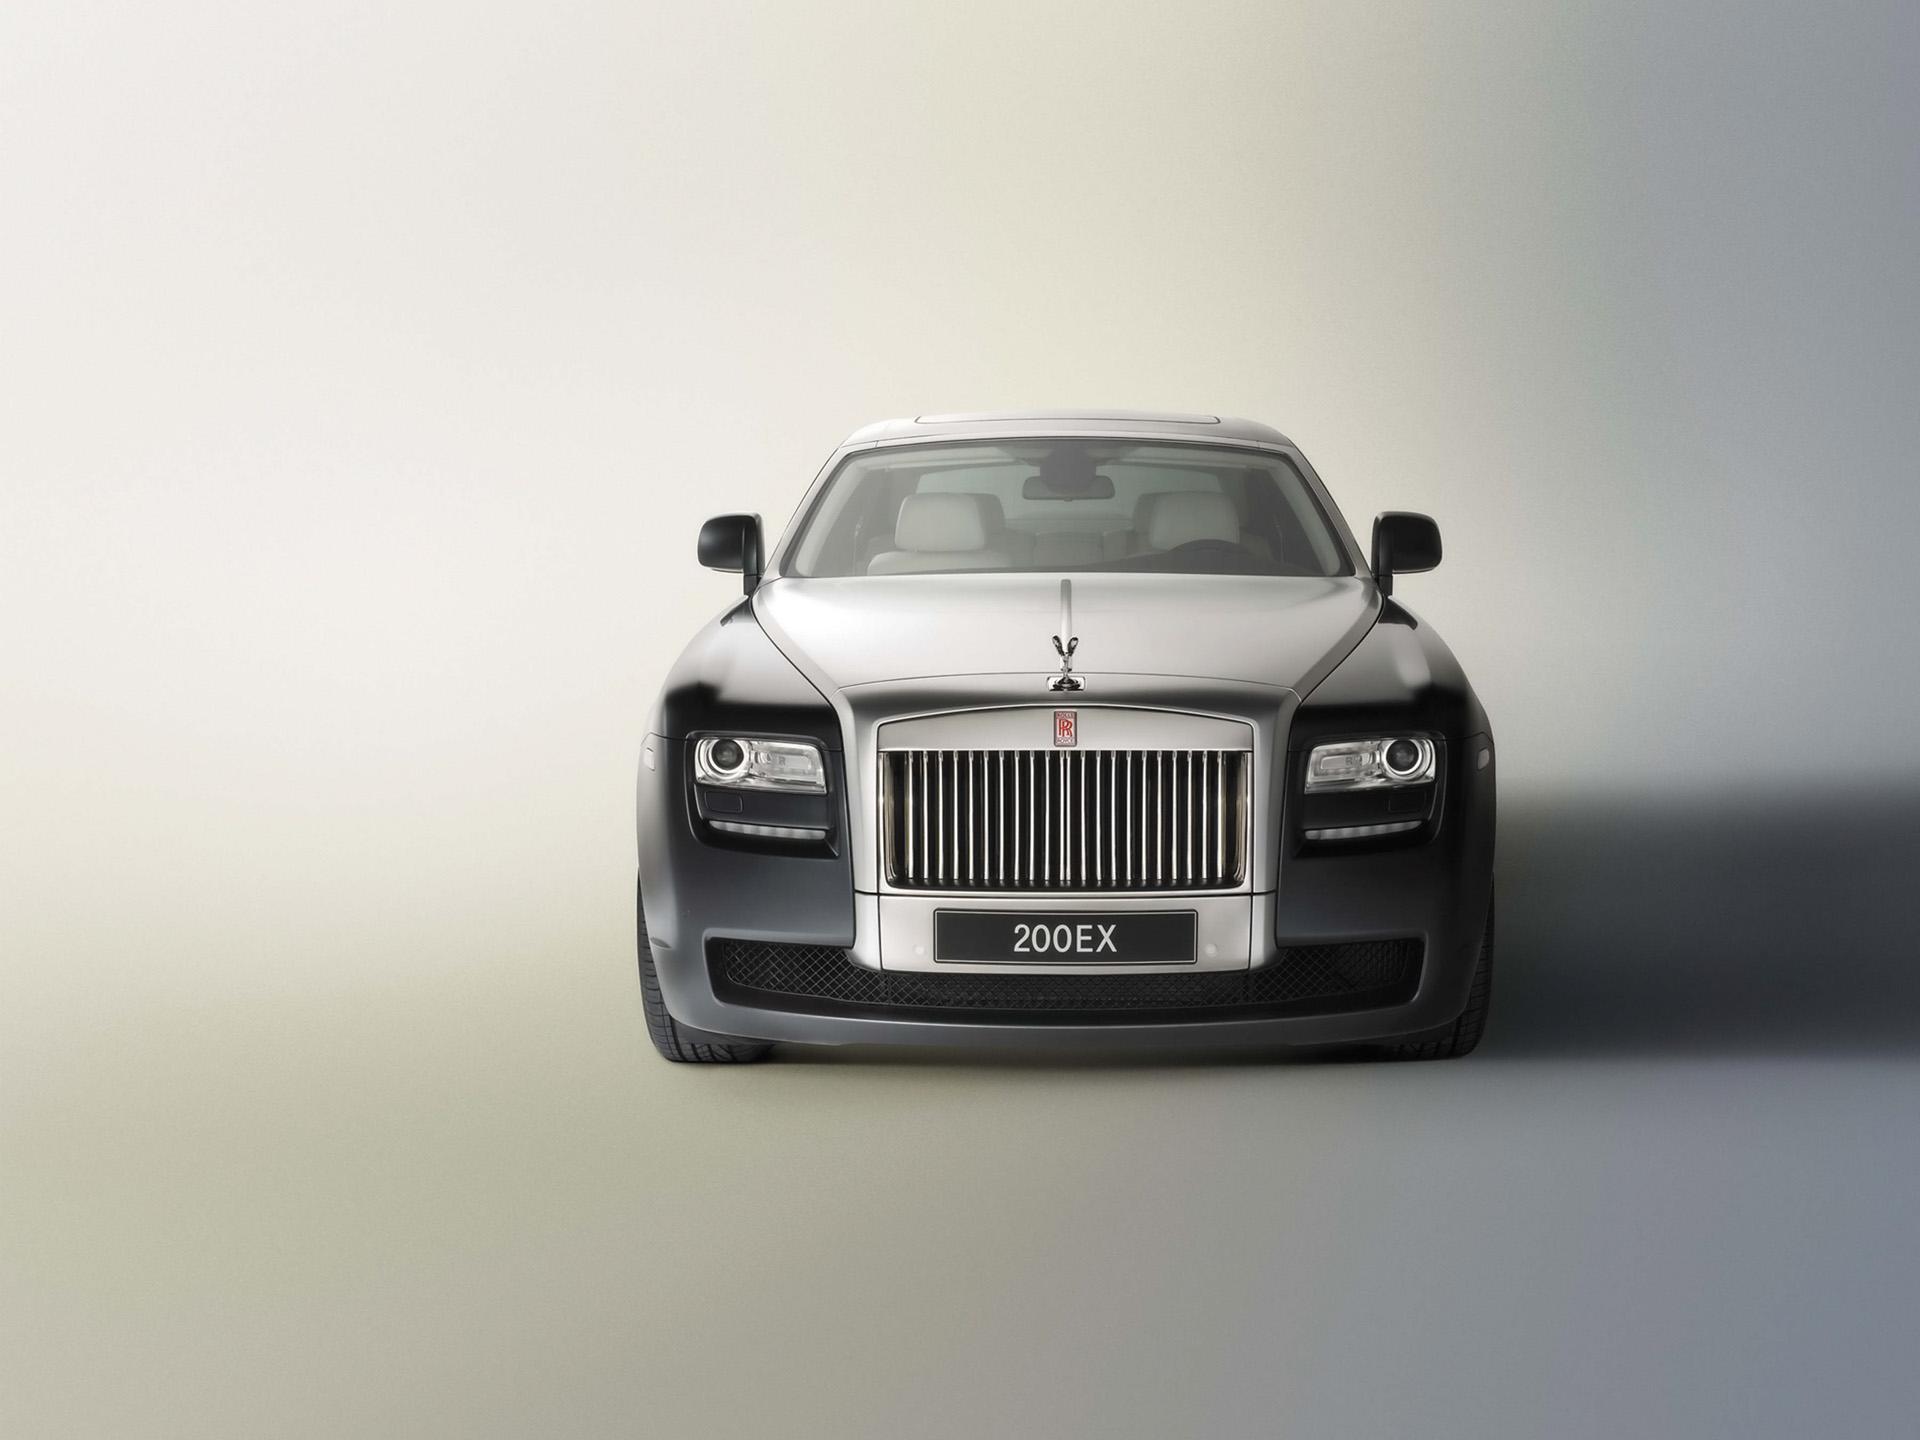 Rolls-Royce 200EX photo #1